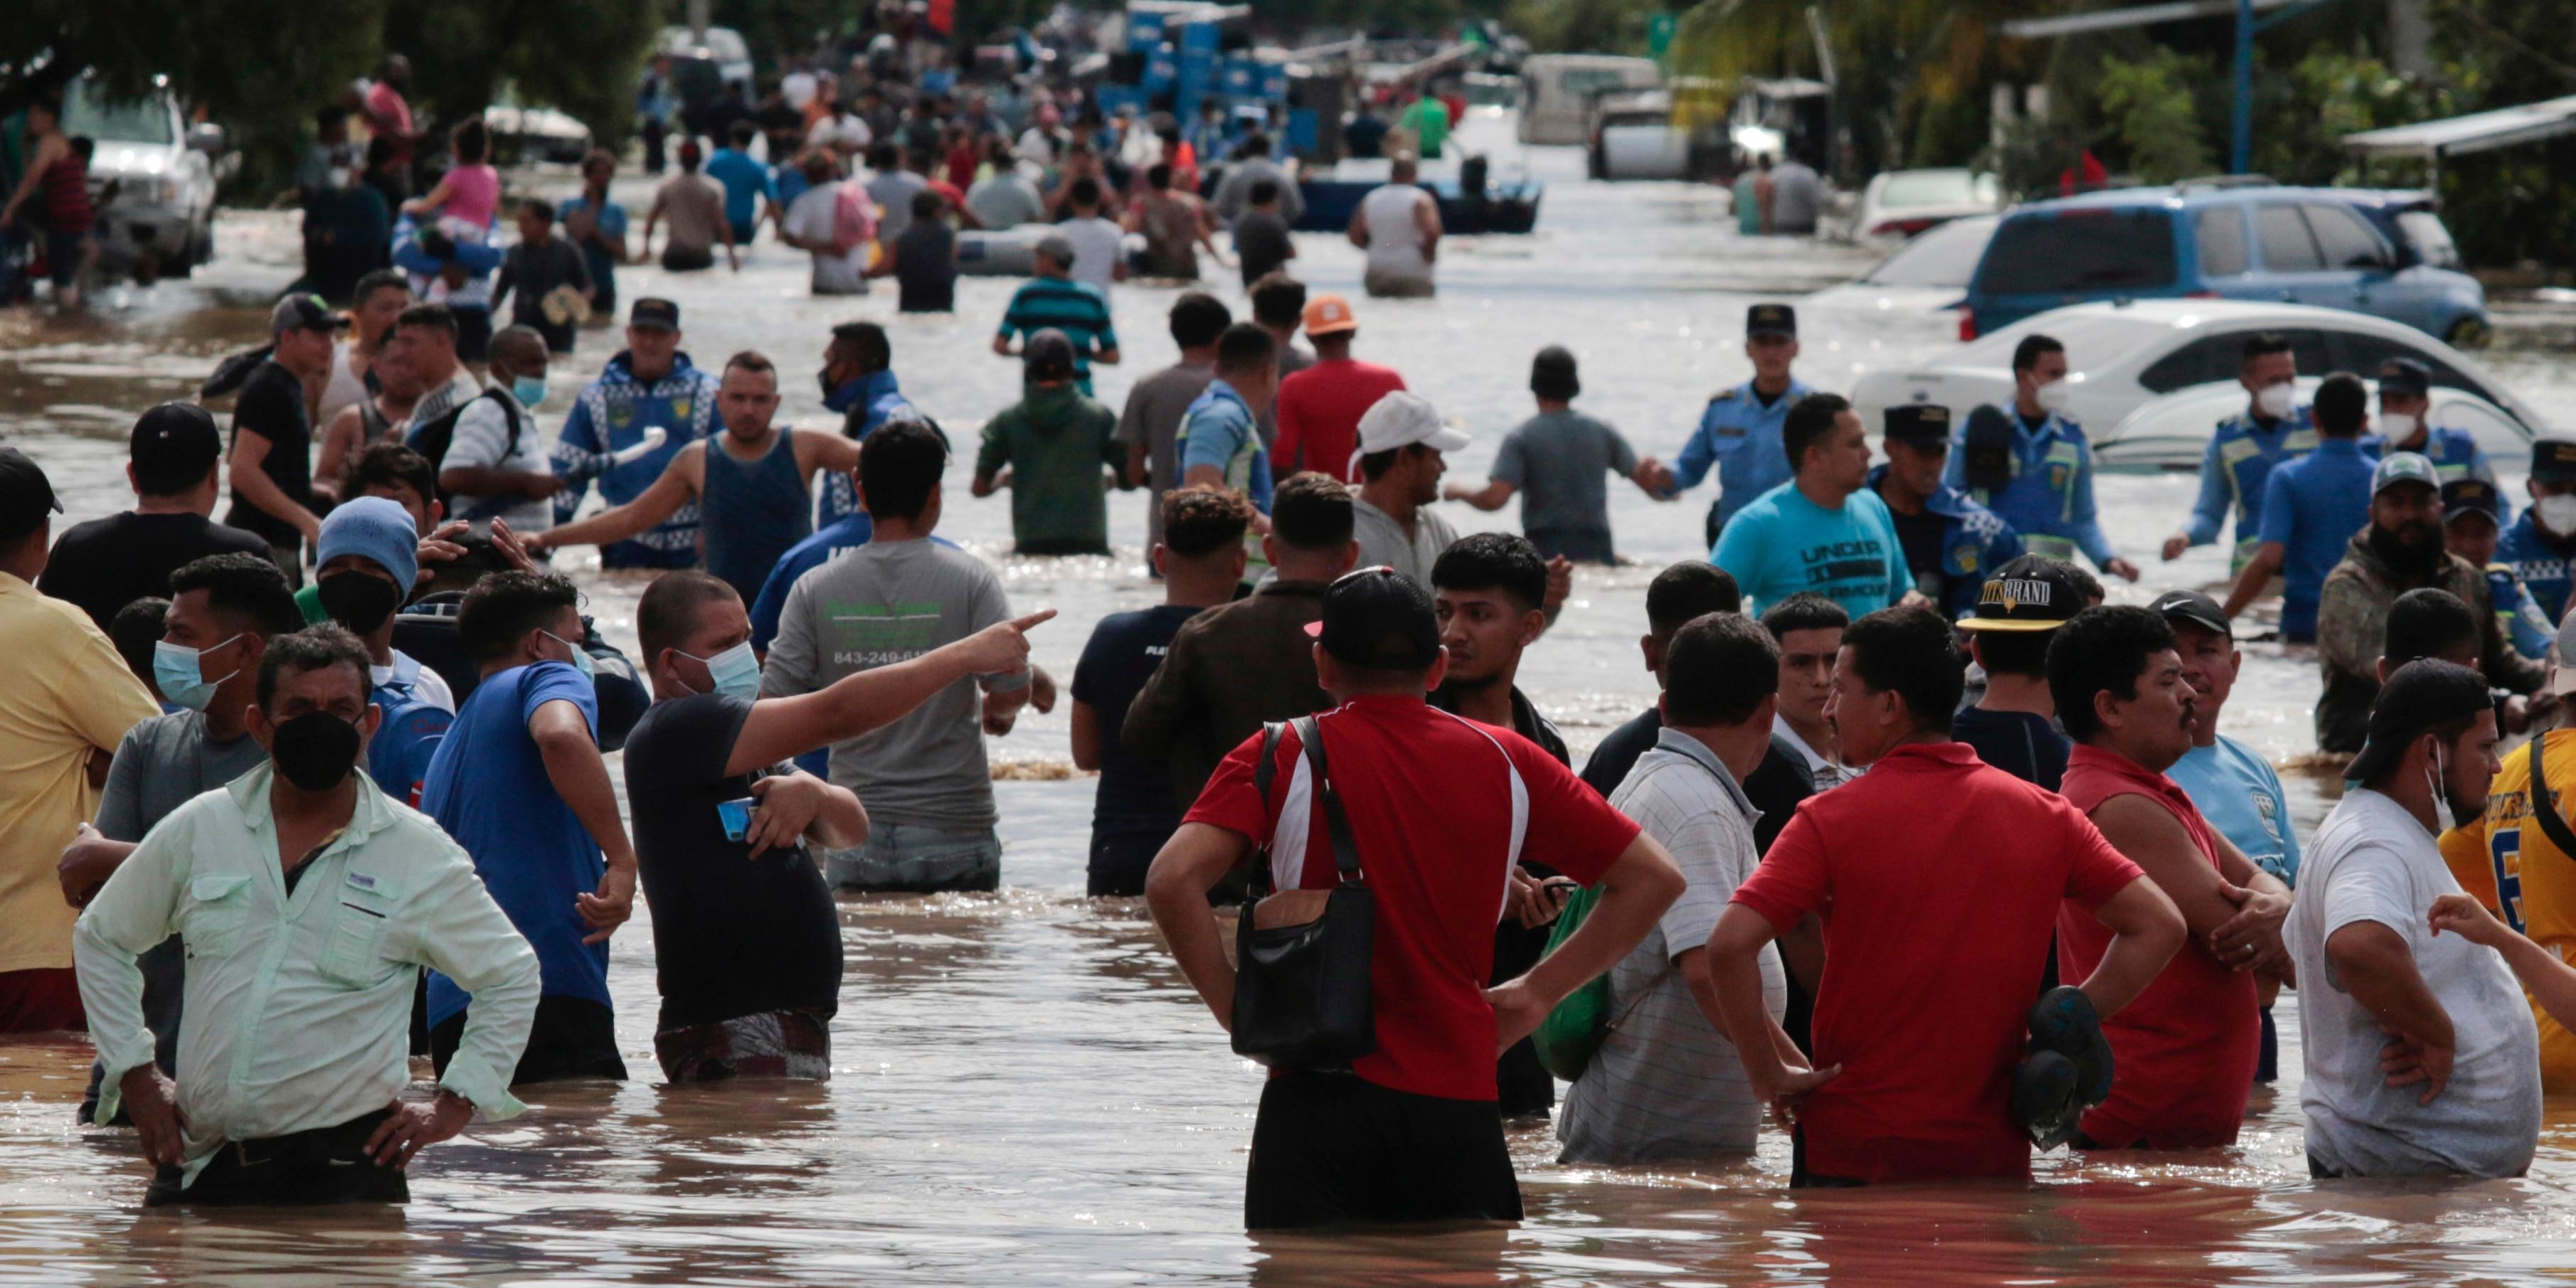 Residents wade through a flooded road in the aftermath of Hurricane Eta in Planeta, Honduras, on Nov. 5, 2020.